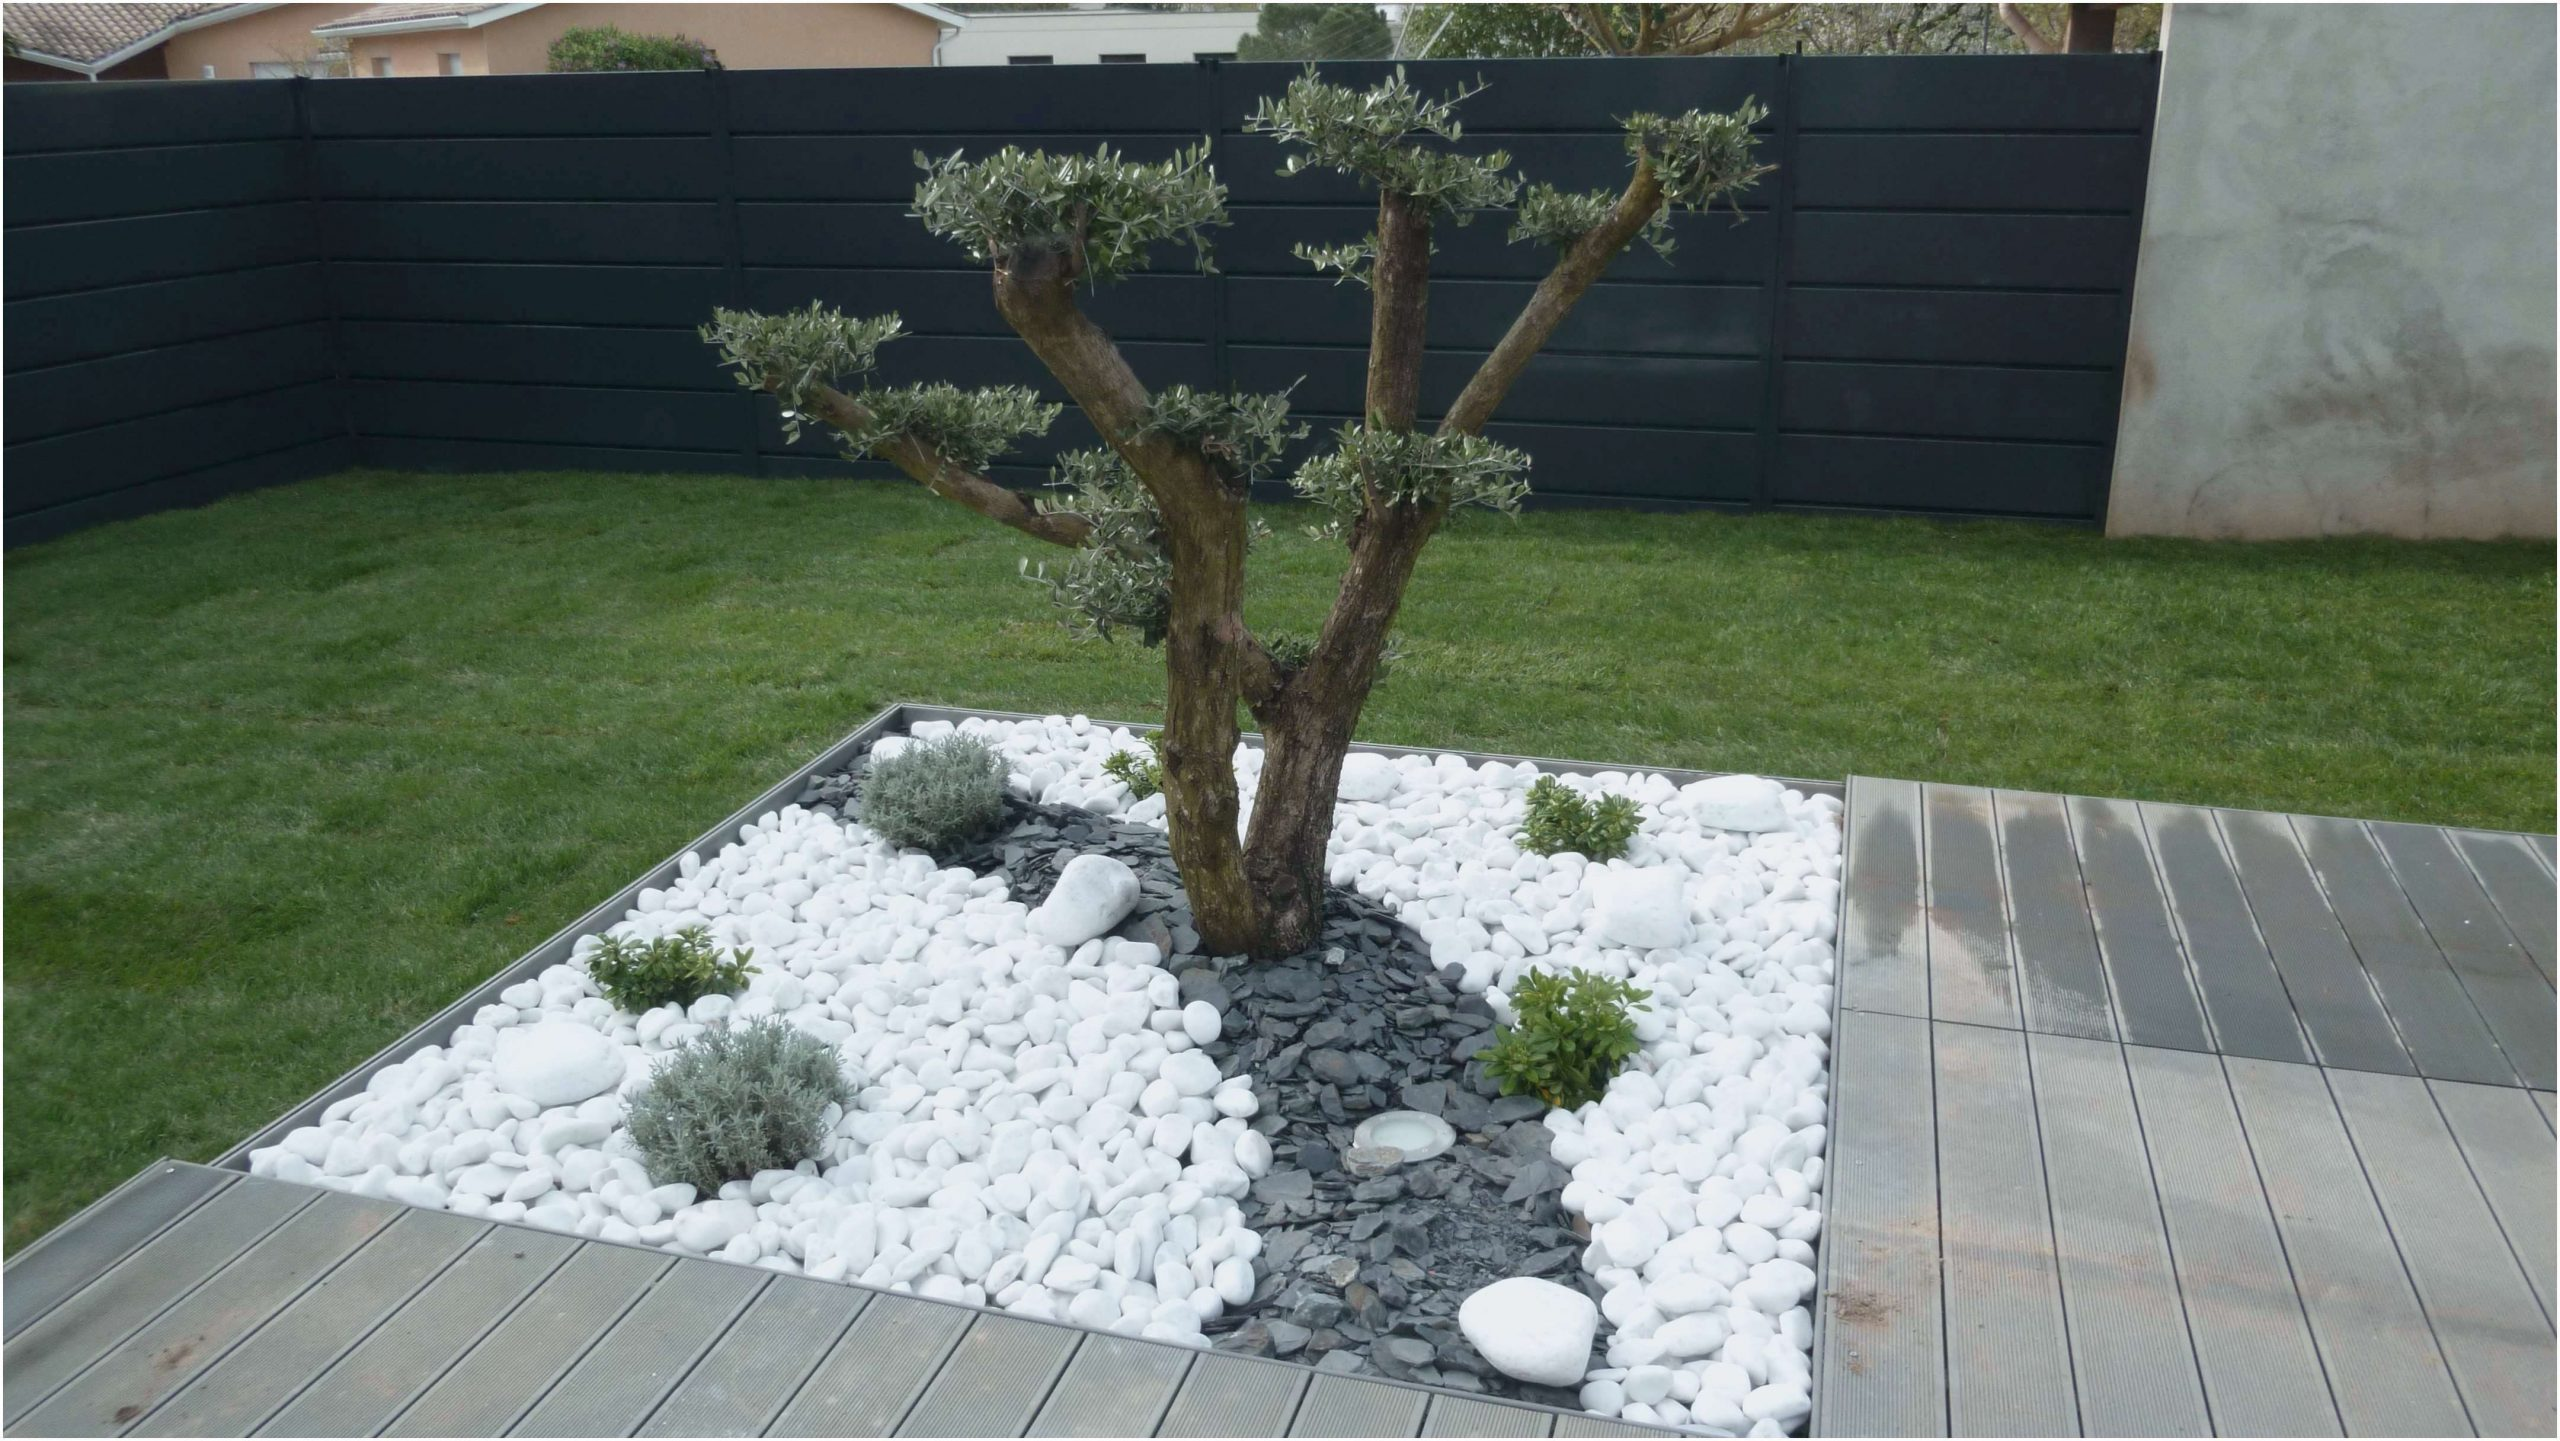 Idee Deco Jardin Avec Gravillon | Idee Deco Jardin ... dedans Galet Blanc Jardin Pas Cher